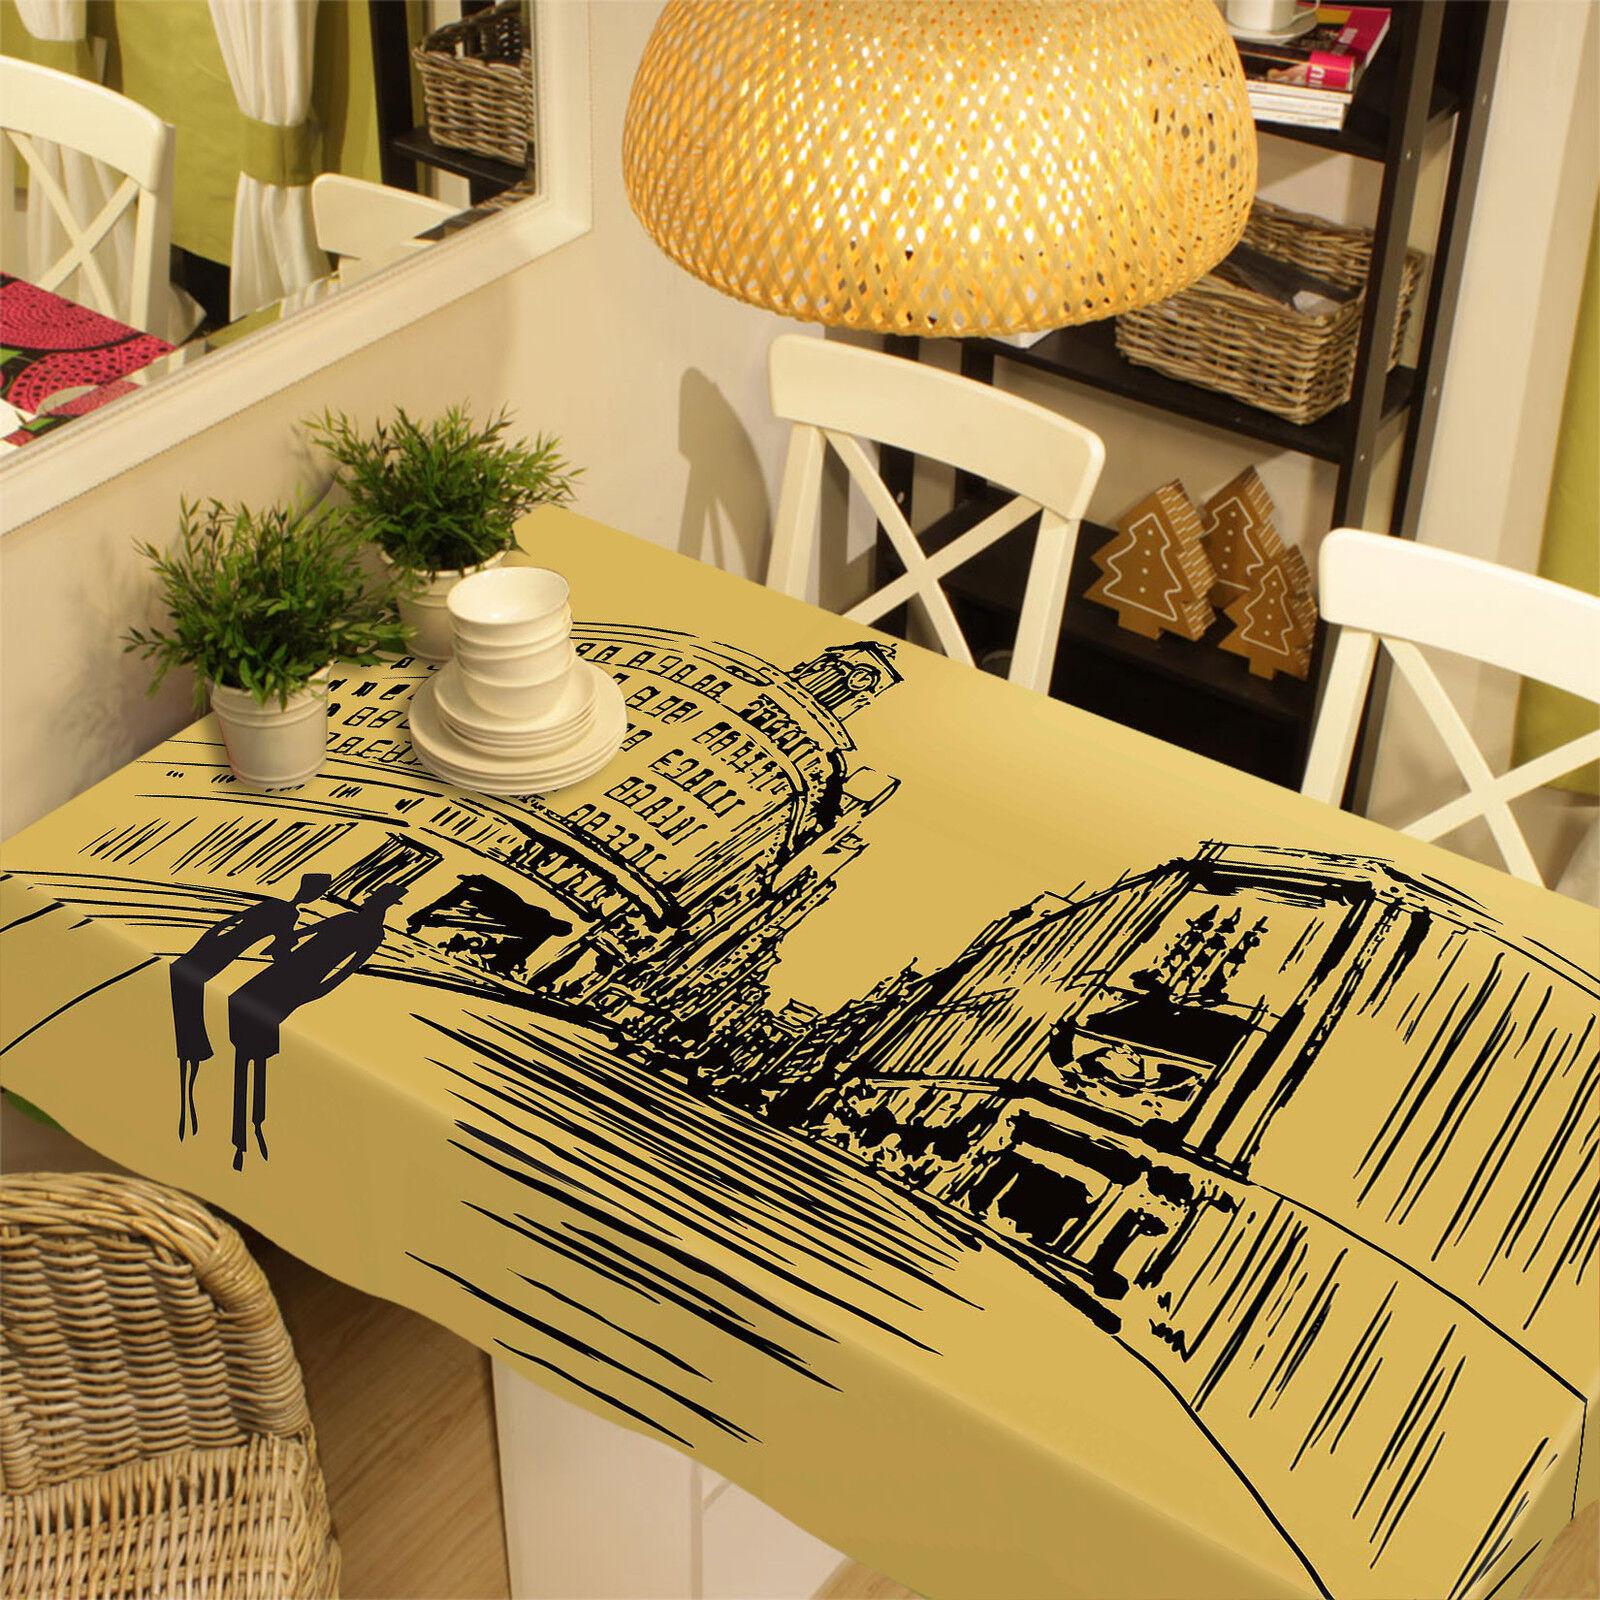 3D Gebäude 61 Tischdecke Tischdecke Tuch Geburtstagsfeier AJ WALLPAPER DE Lemon